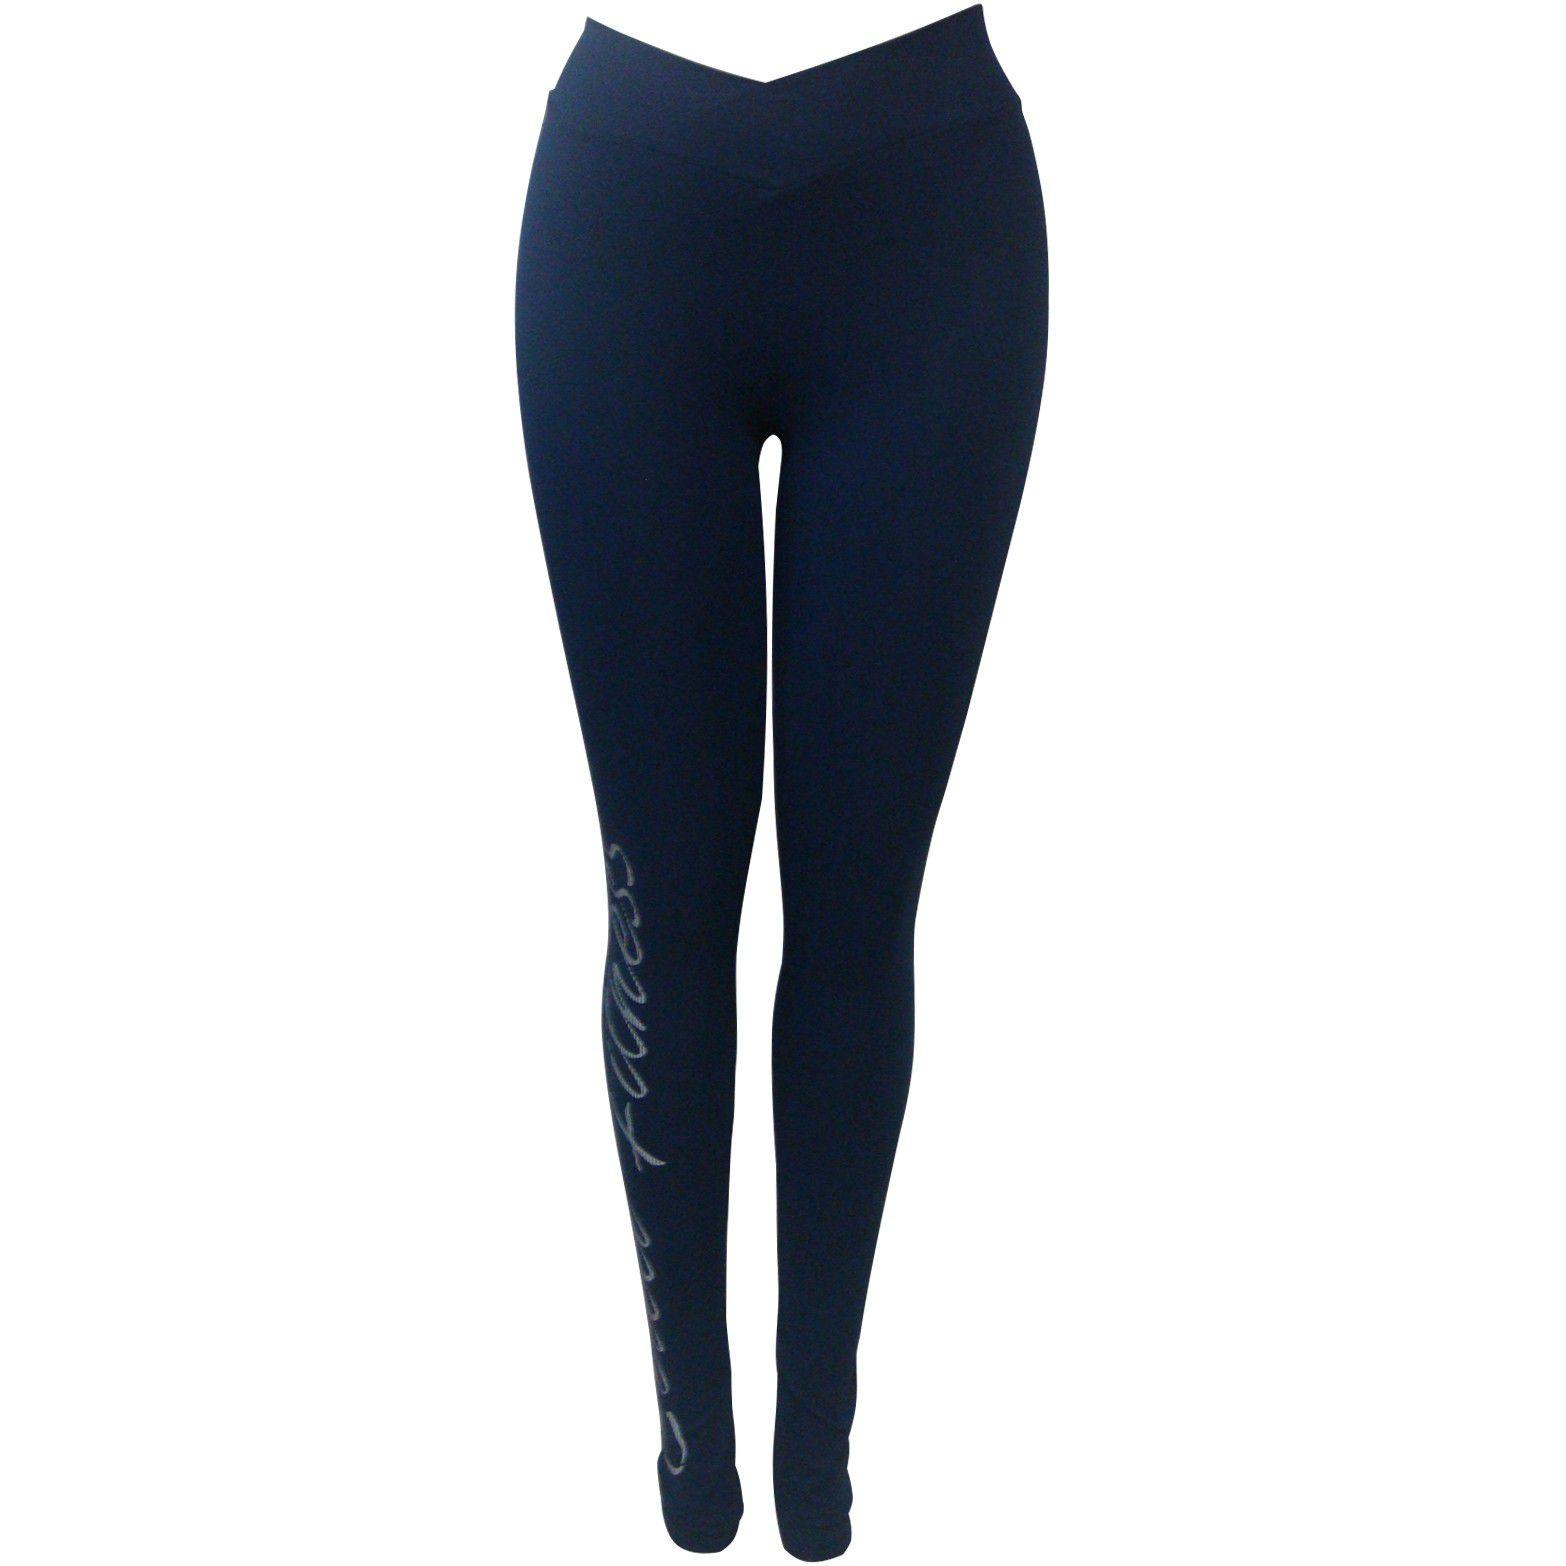 6199dbeda13f98 Calça Legging Colcci Fitness Estampada Feminina Ref 0025700303 ...